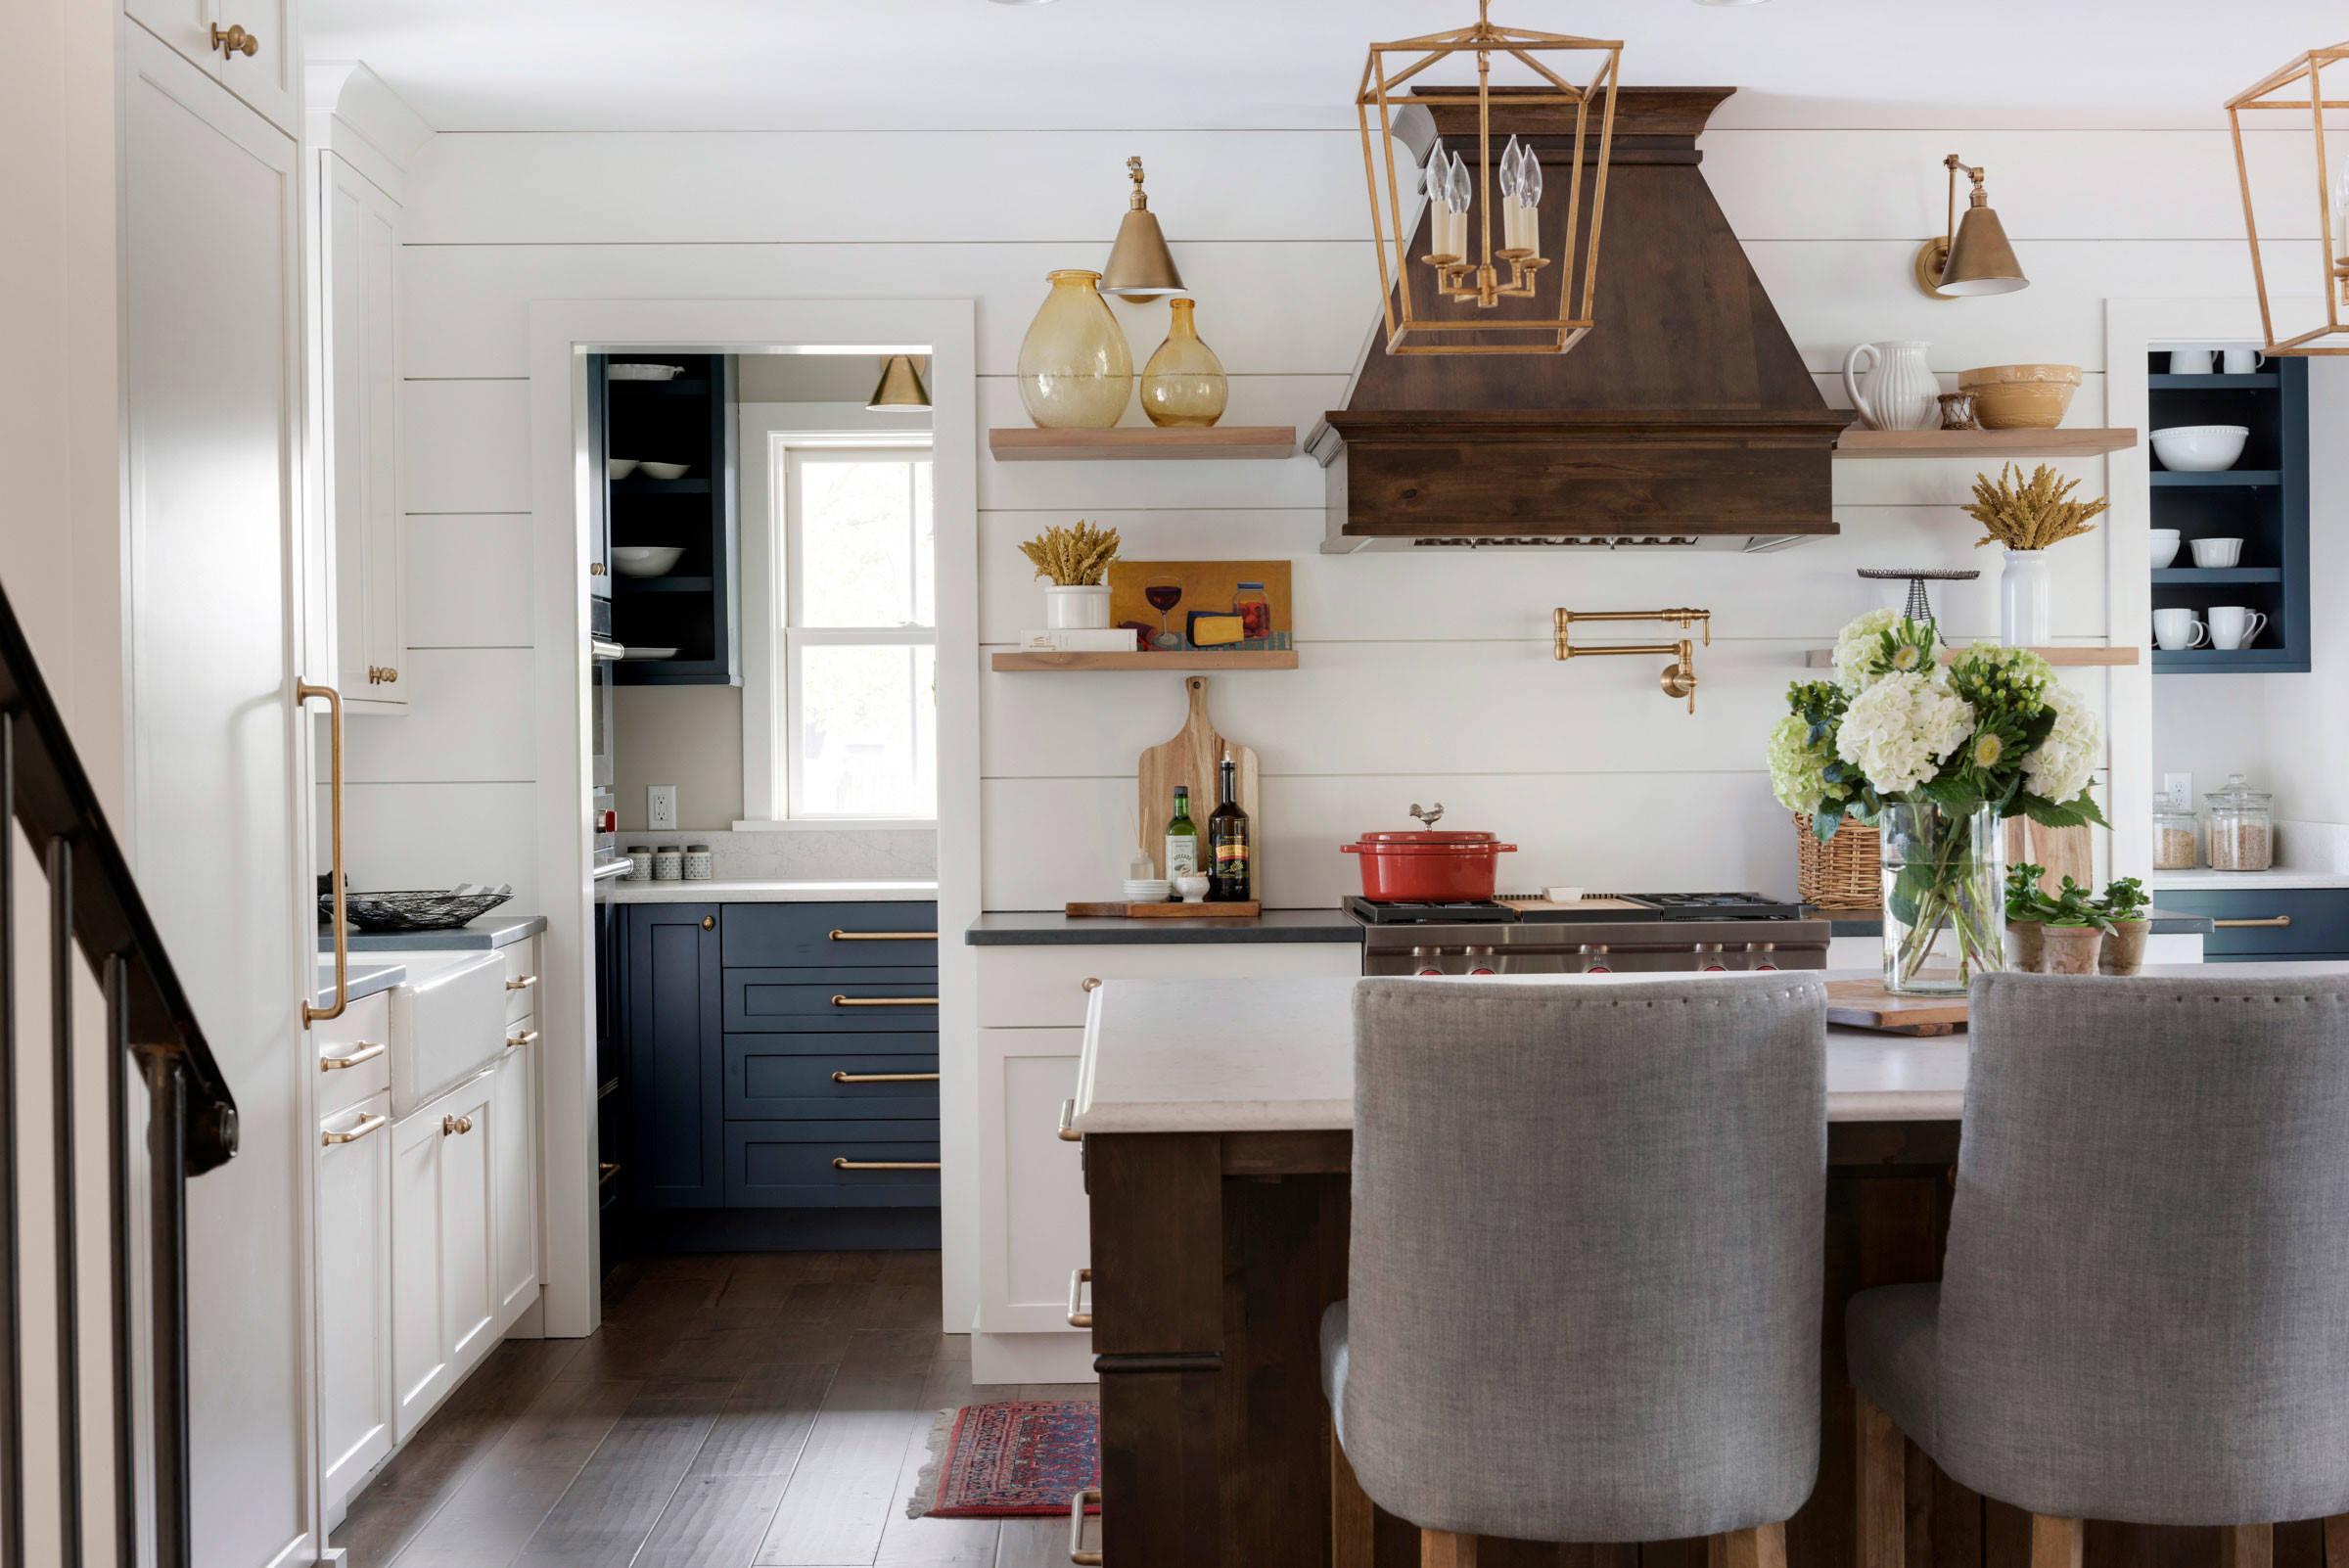 75 Beautiful Kitchen With Shiplap Backsplash Pictures Ideas July 2021 Houzz